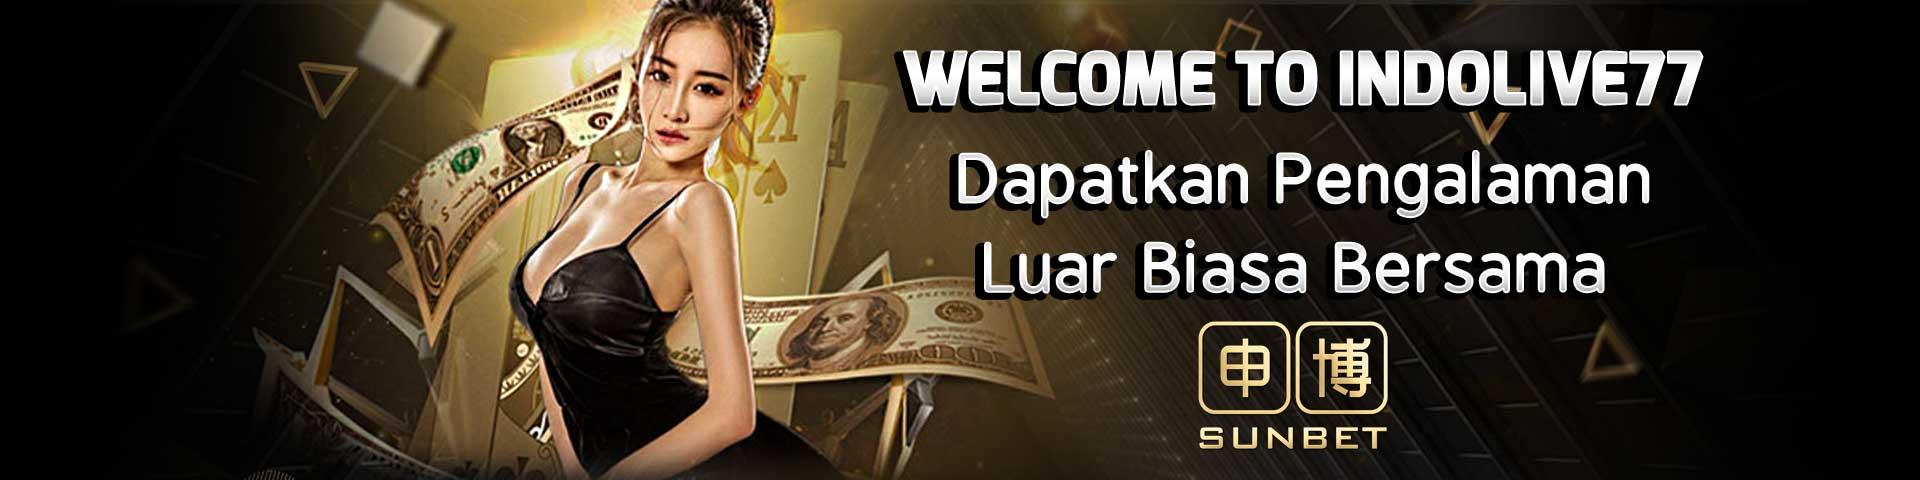 Sunbet Platform Live Casino Online Asia Terkemuka di Indonesia